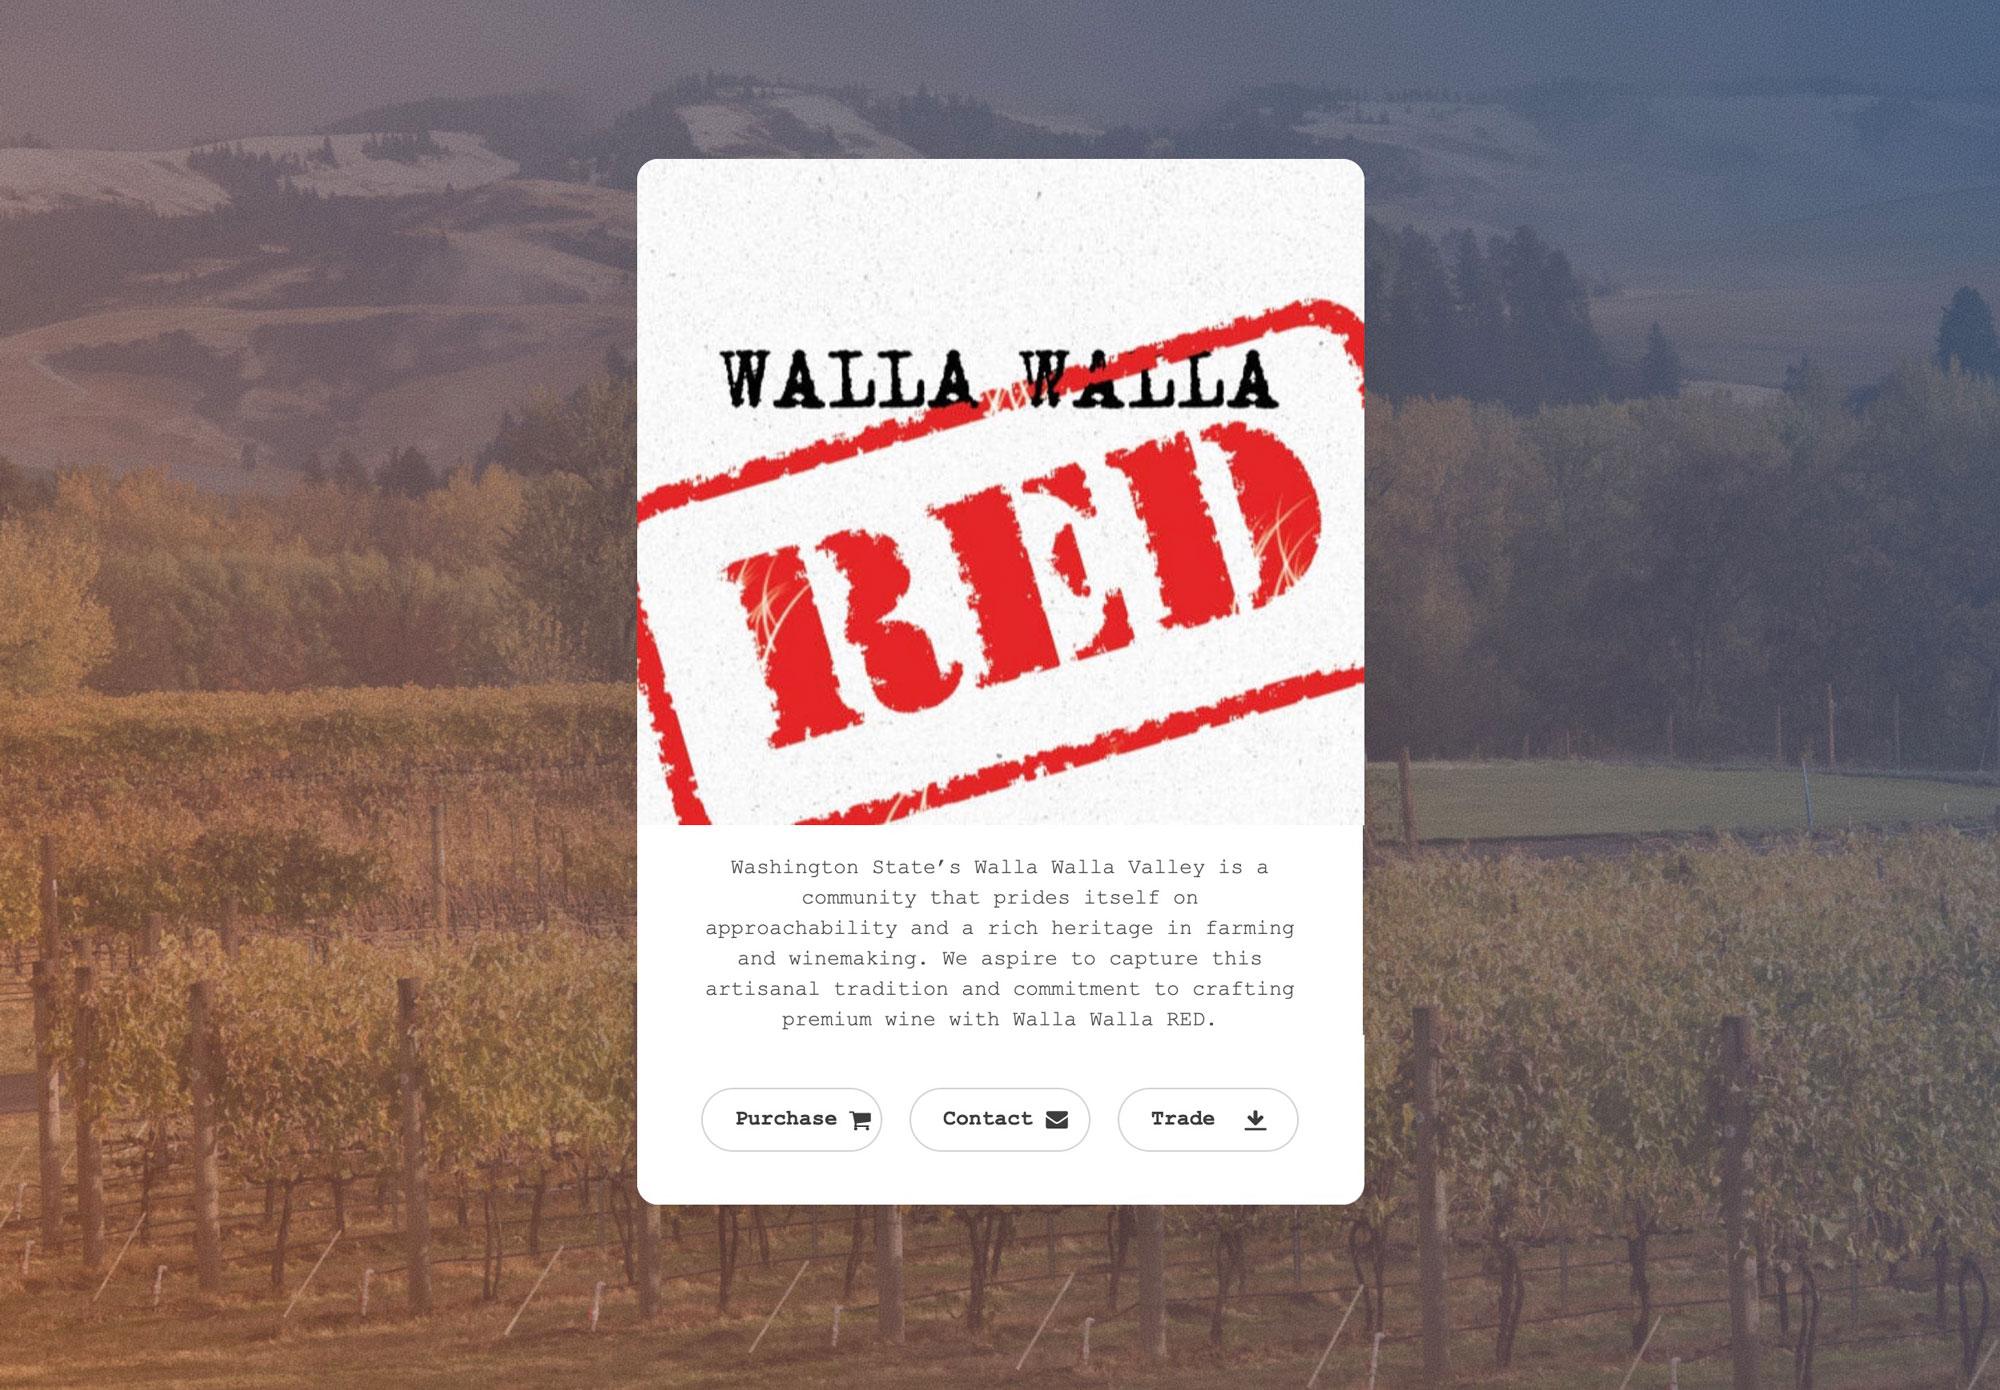 Walla Walla RED microsite example